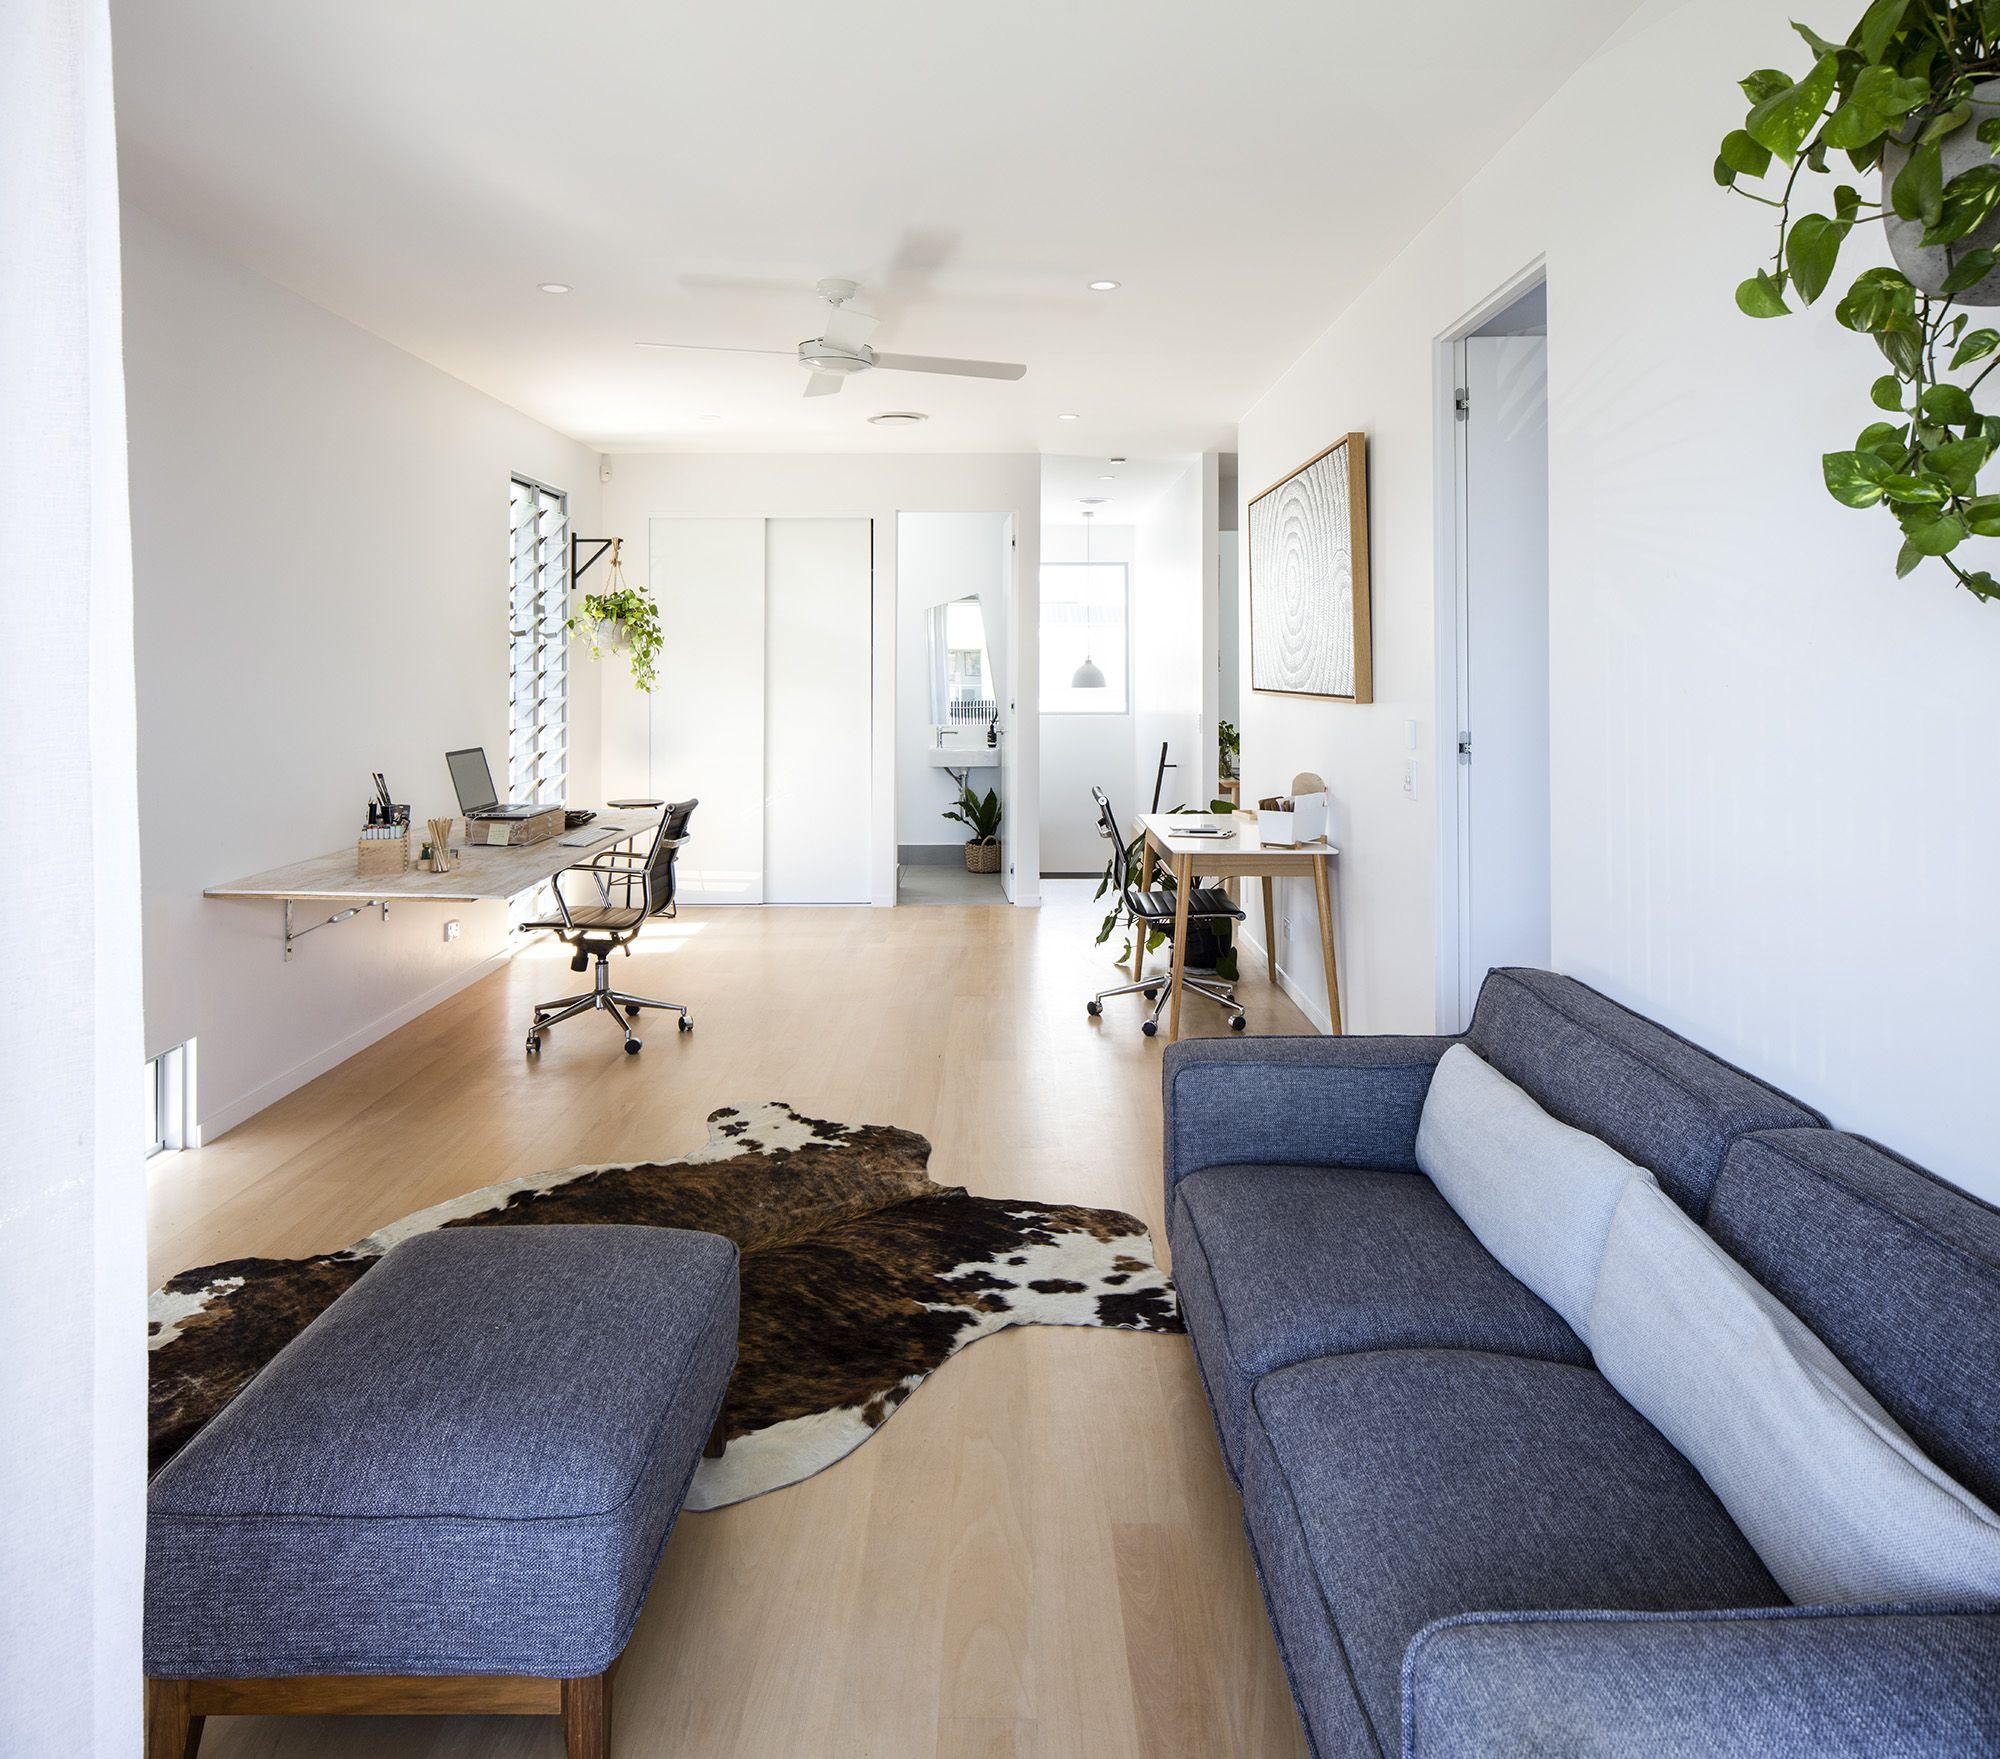 Custom home design by immackulate designer homes yaroomba project located on the sunshine coast qld australia designerhome architecture also handsome interior rh pinterest